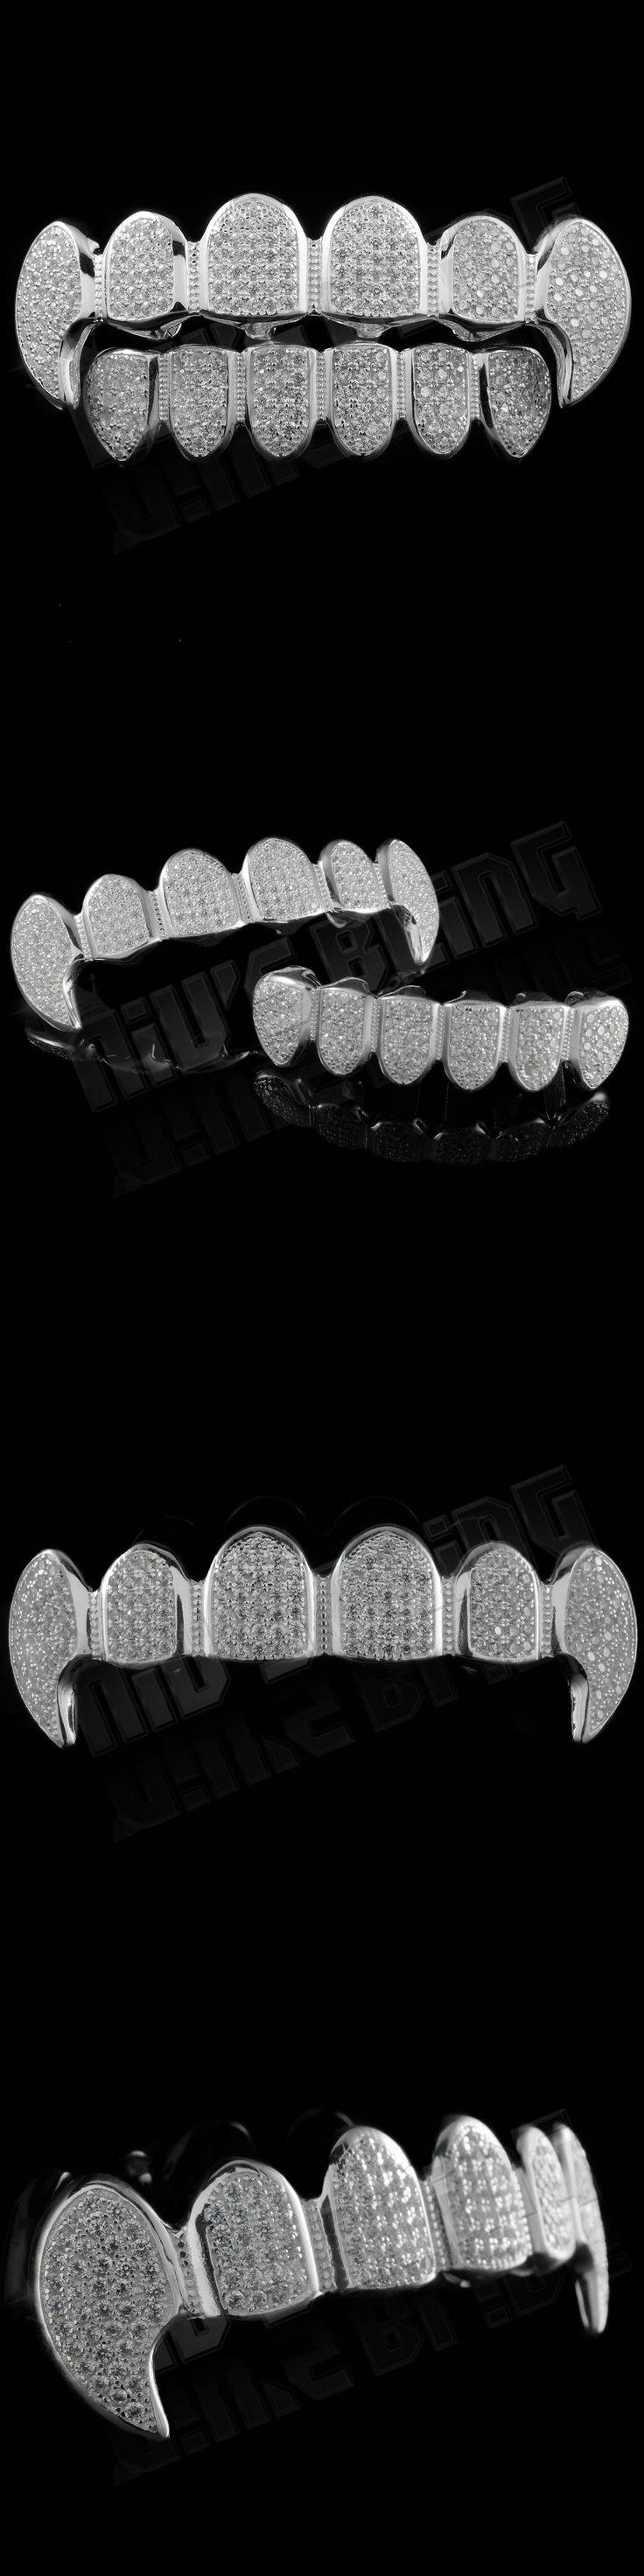 Grillz Dental Grills 152808: .925 Sterling Silver Vampire Dracula Fangs Top Bottom Joker Grillz Teeth Grills BUY IT NOW ONLY: $64.99